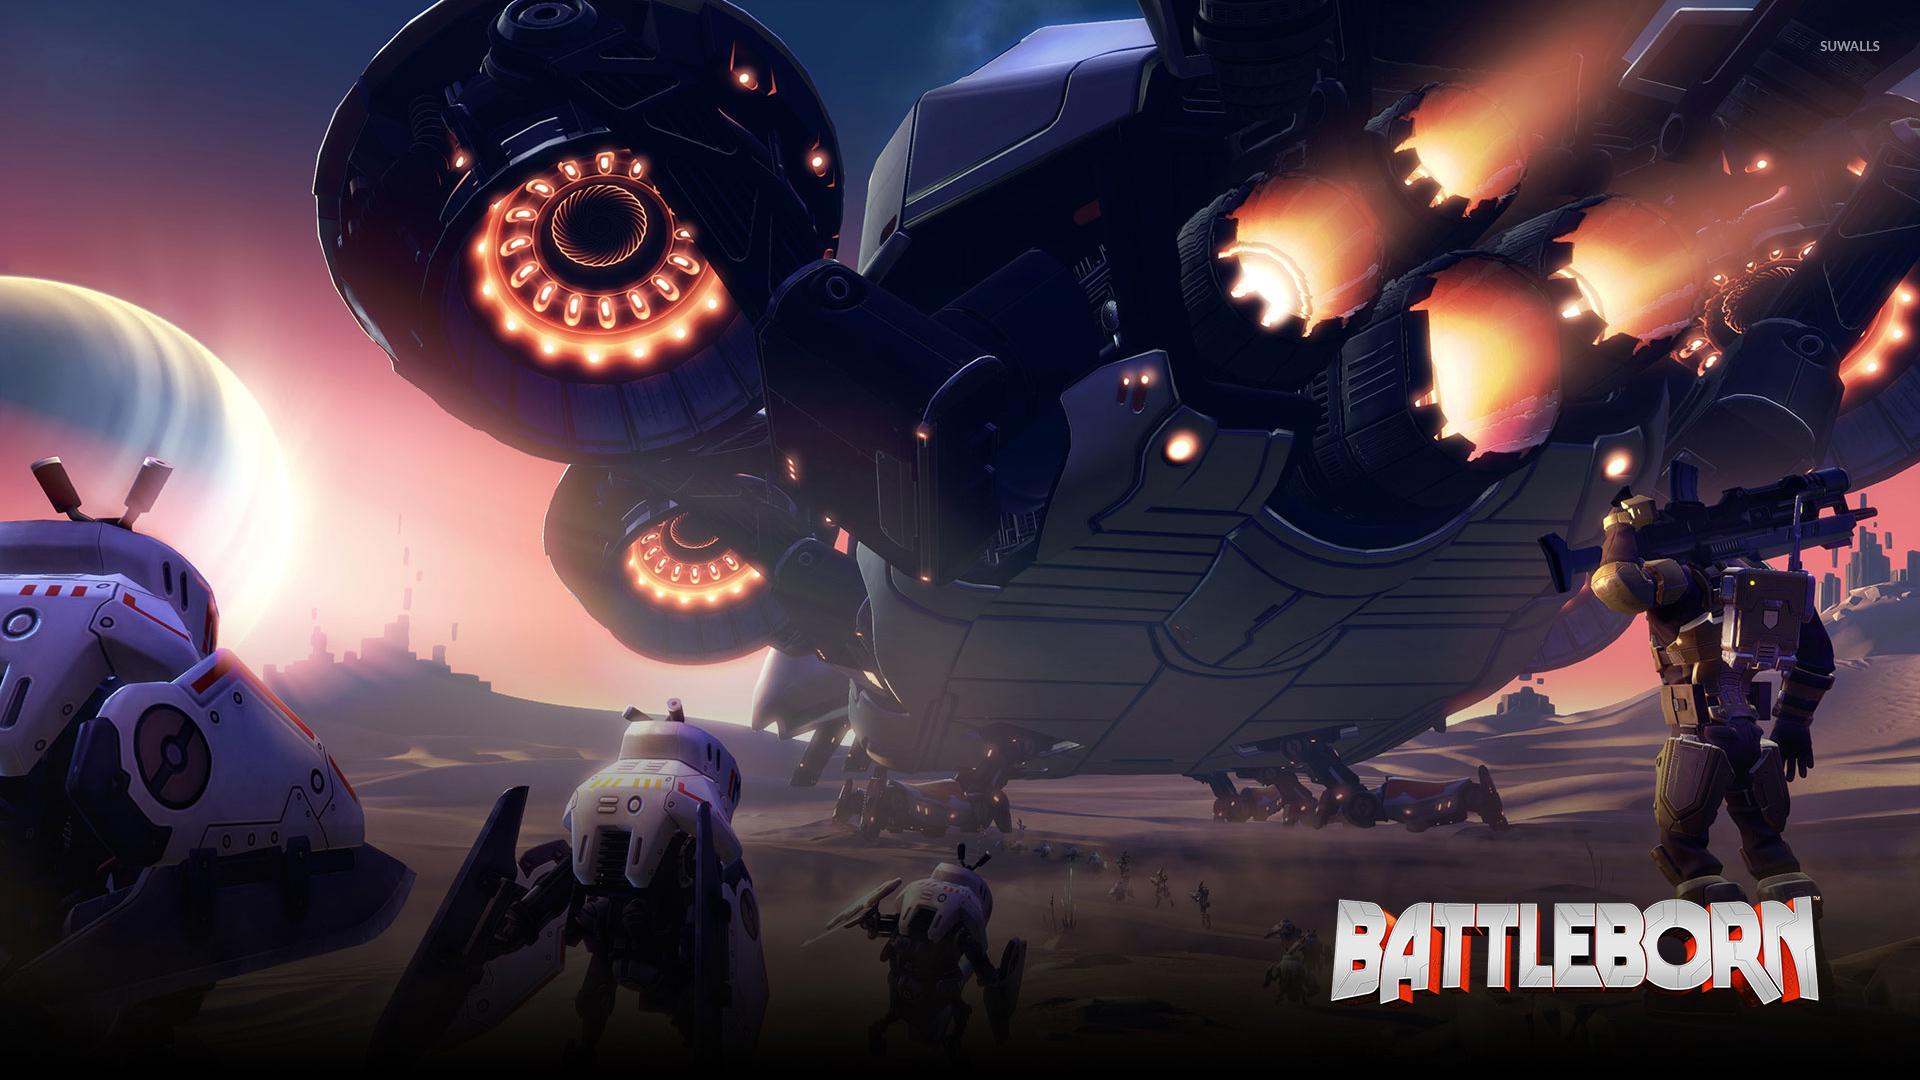 Spaceship In Battleborn Wallpaper Game Wallpapers 50411